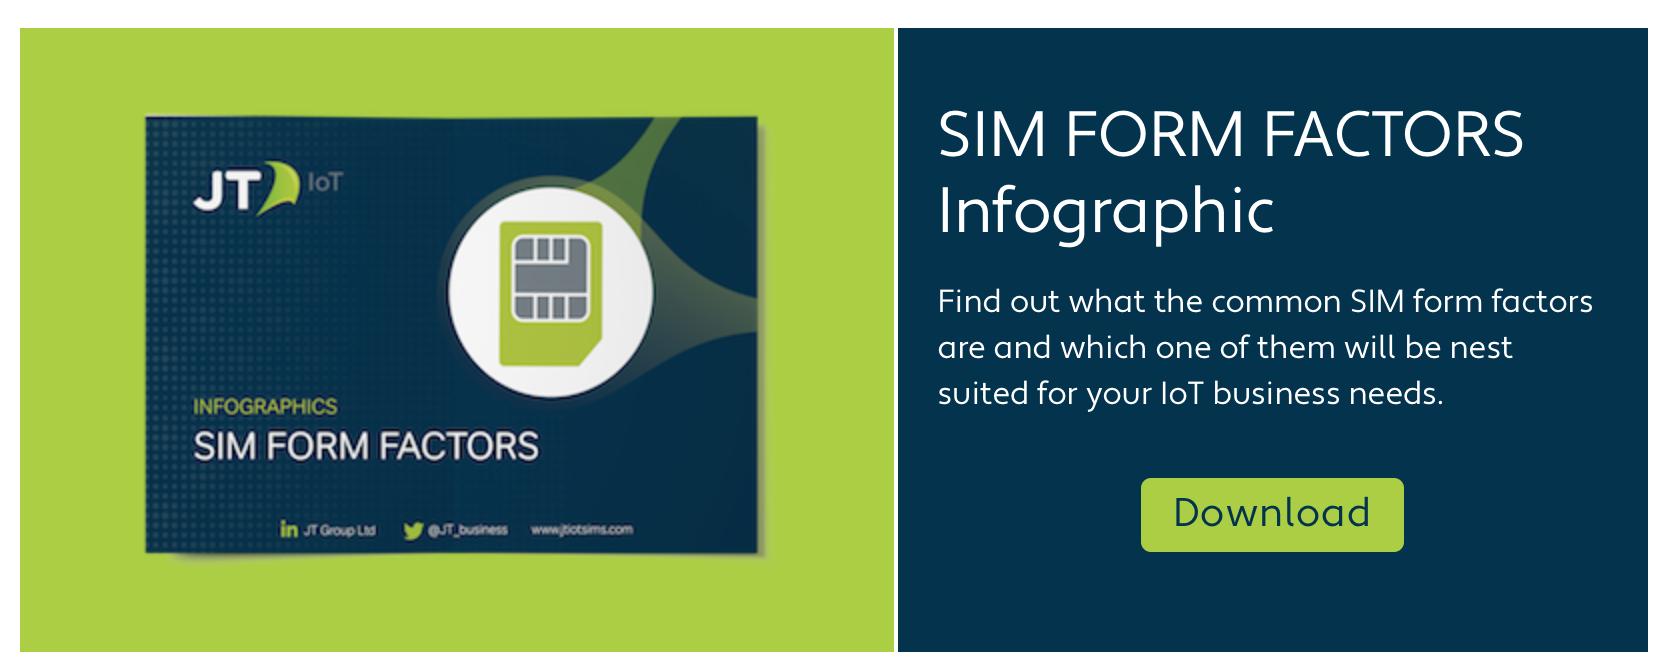 SIM Form Factor Infographic